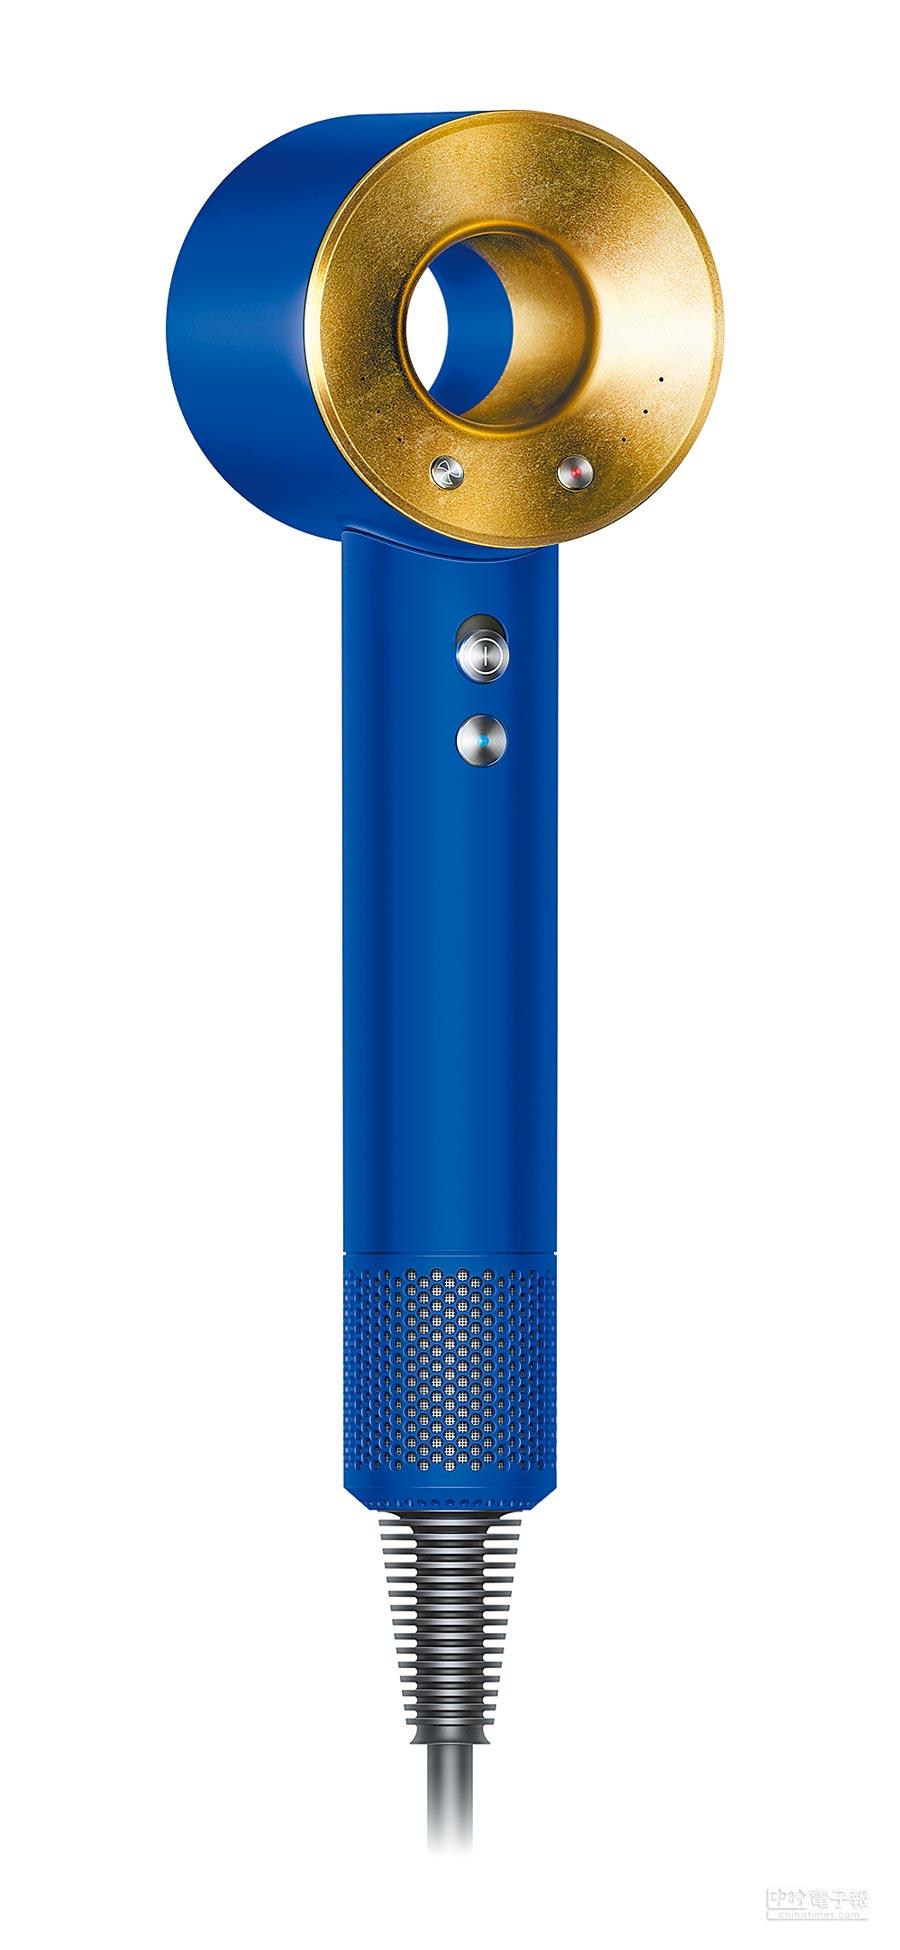 Dyson Supersonic吹風機23.75K金箔特別限定版,1萬7600元,現享新品上市體驗價1萬6200元,含2年保固。(Dyson提供)